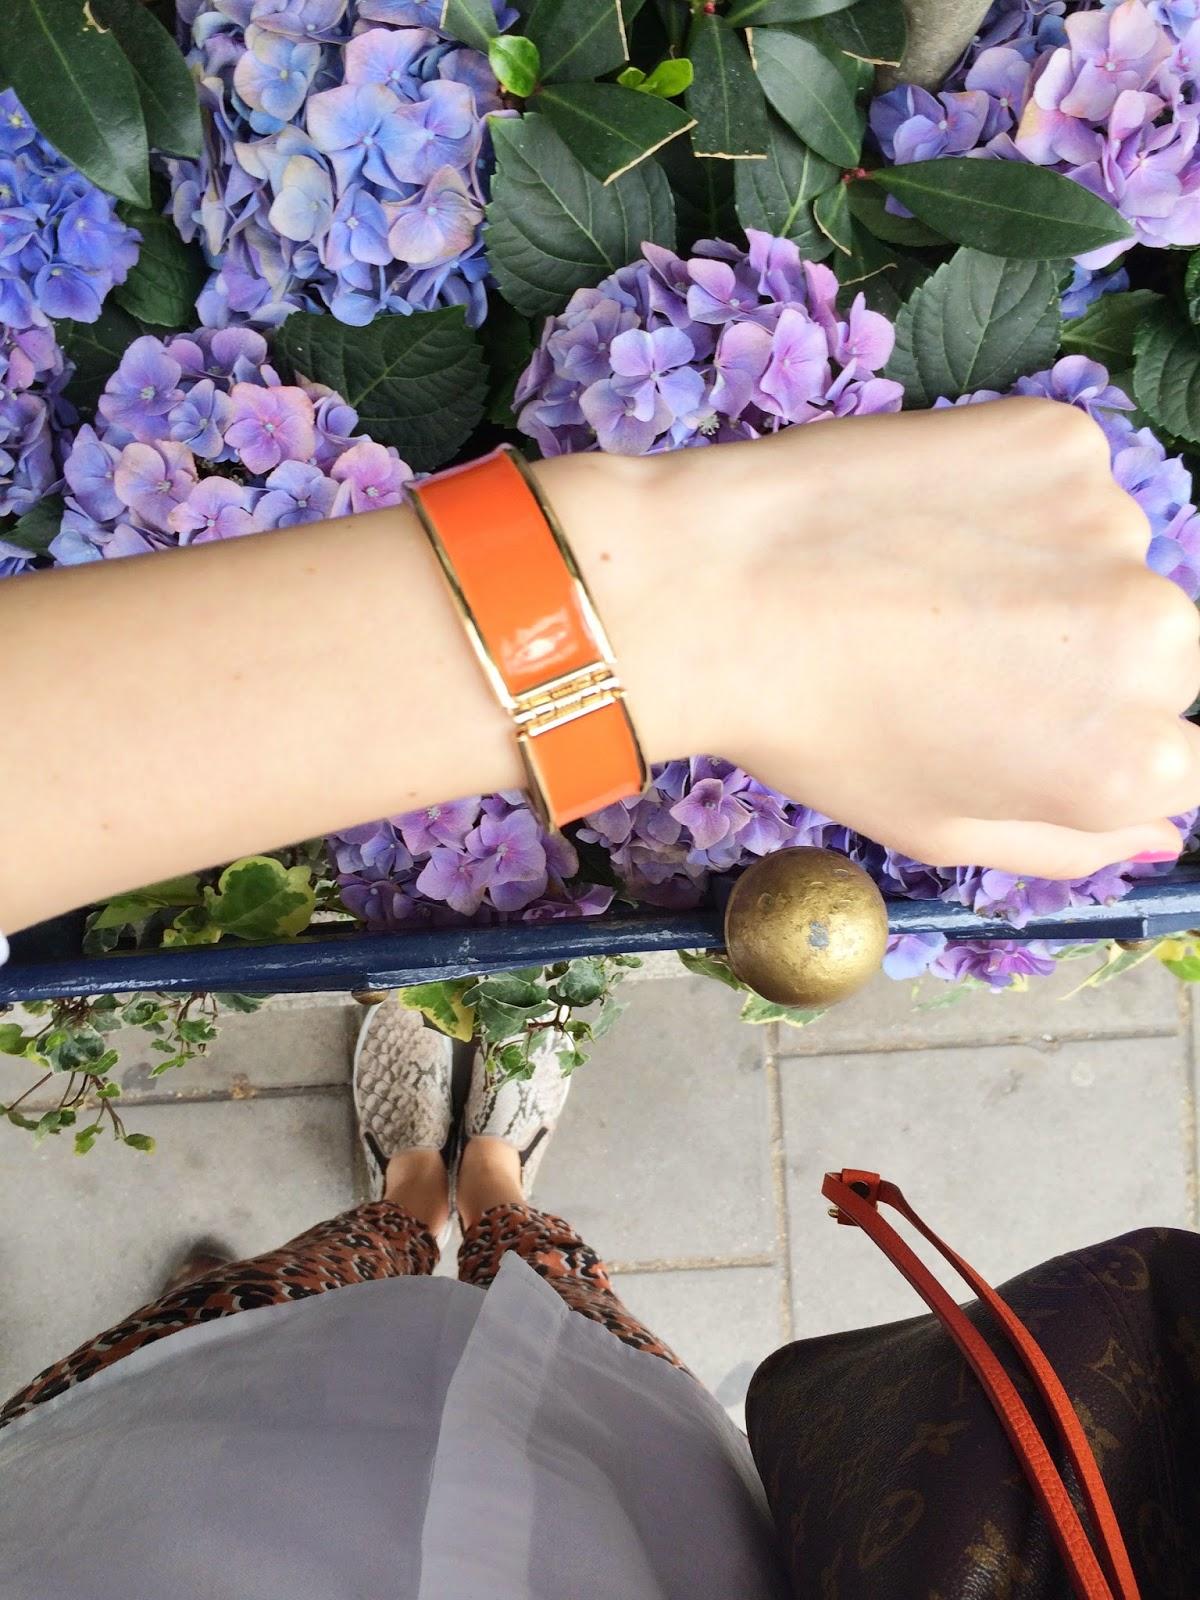 leopard print trousers, slipons, hm slip ons, lv, louis vuitton neverfull, hm bracelet, orange bracelet